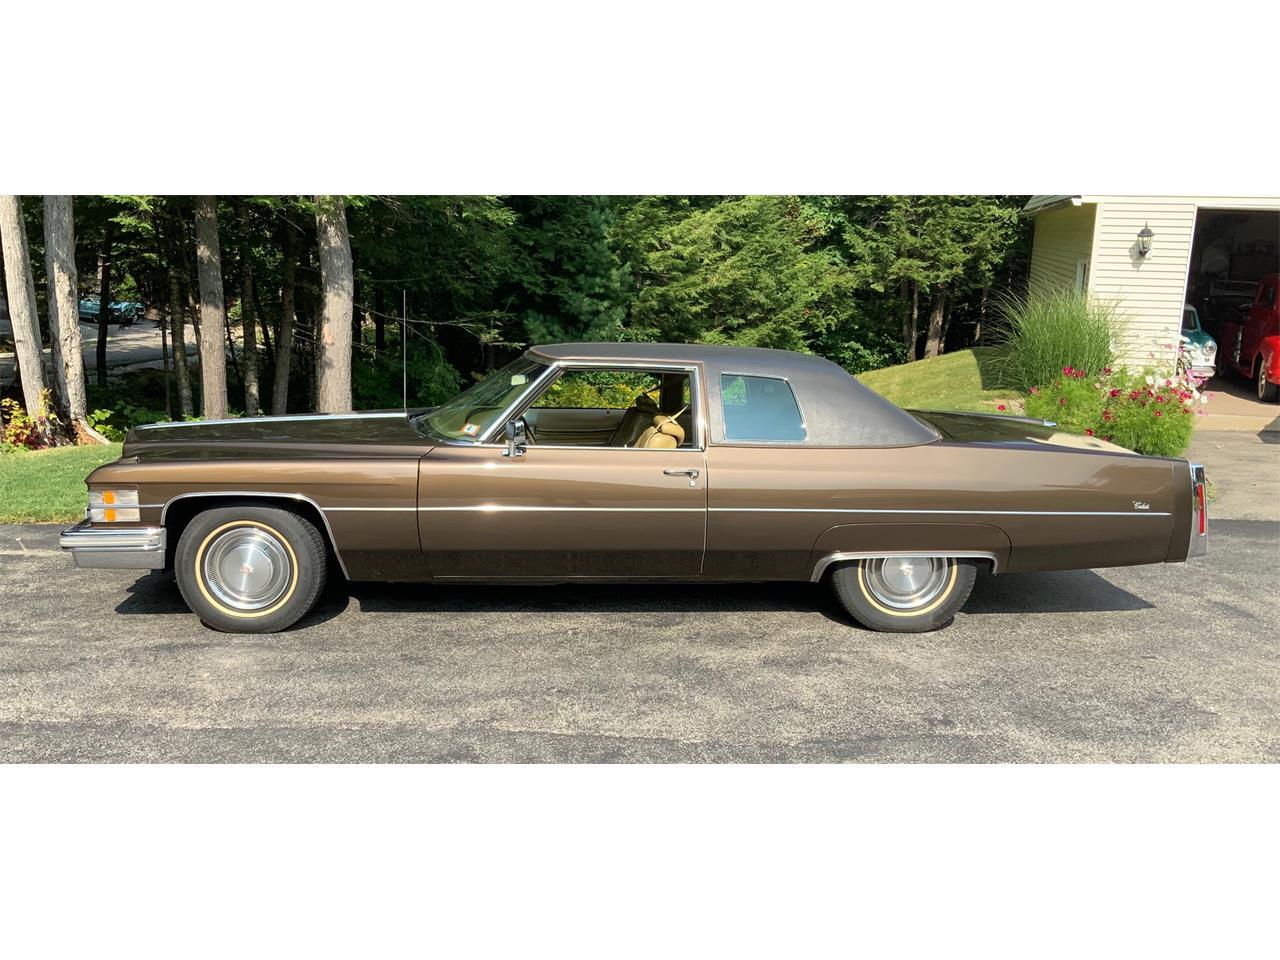 1973 Cadillac Calais (CC-1392658) for sale in Bartlett, New Hampshire